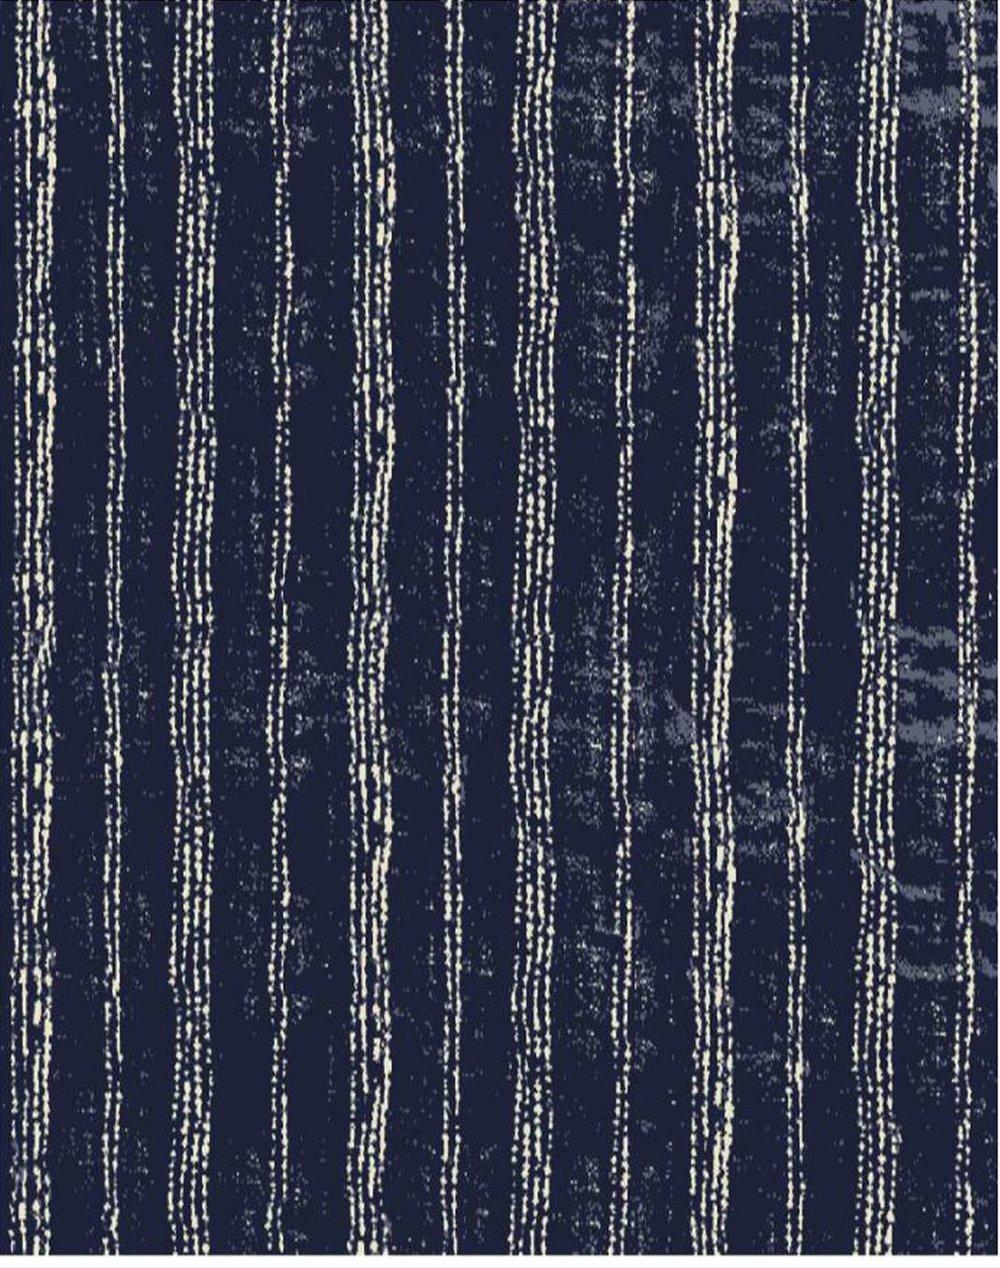 EF 6-17-18 RUG 9 , 8X10 , 40 Knots (Design Plate) (2).jpg